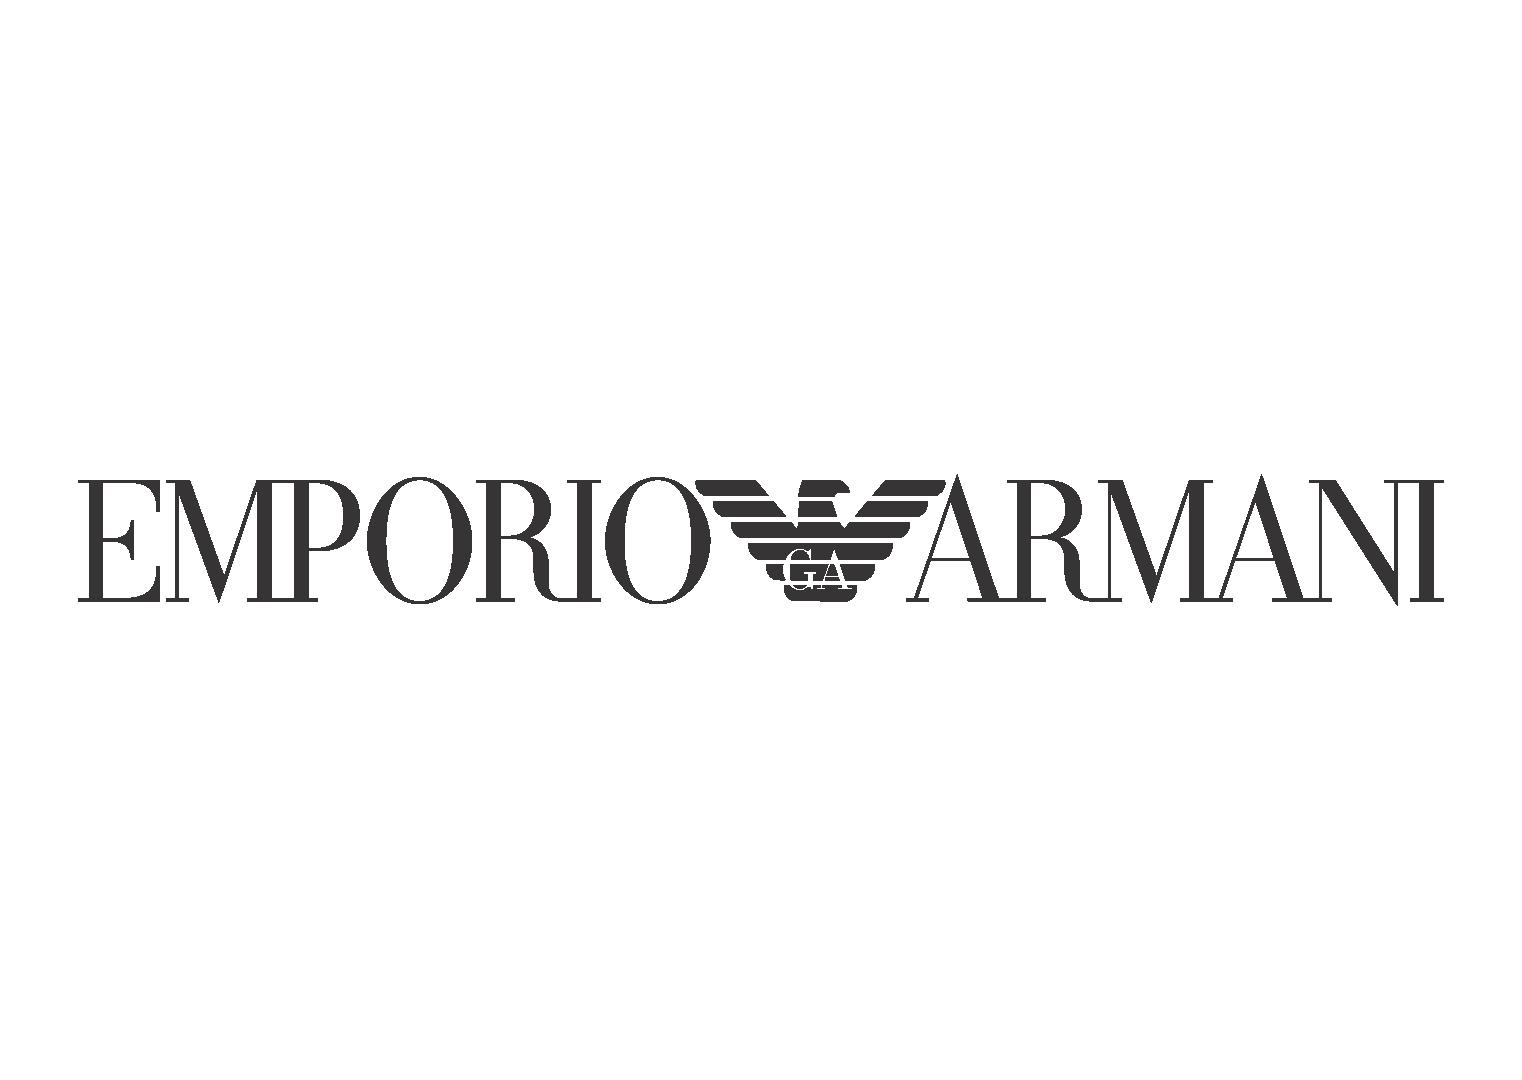 Emporio Armani Watches Image